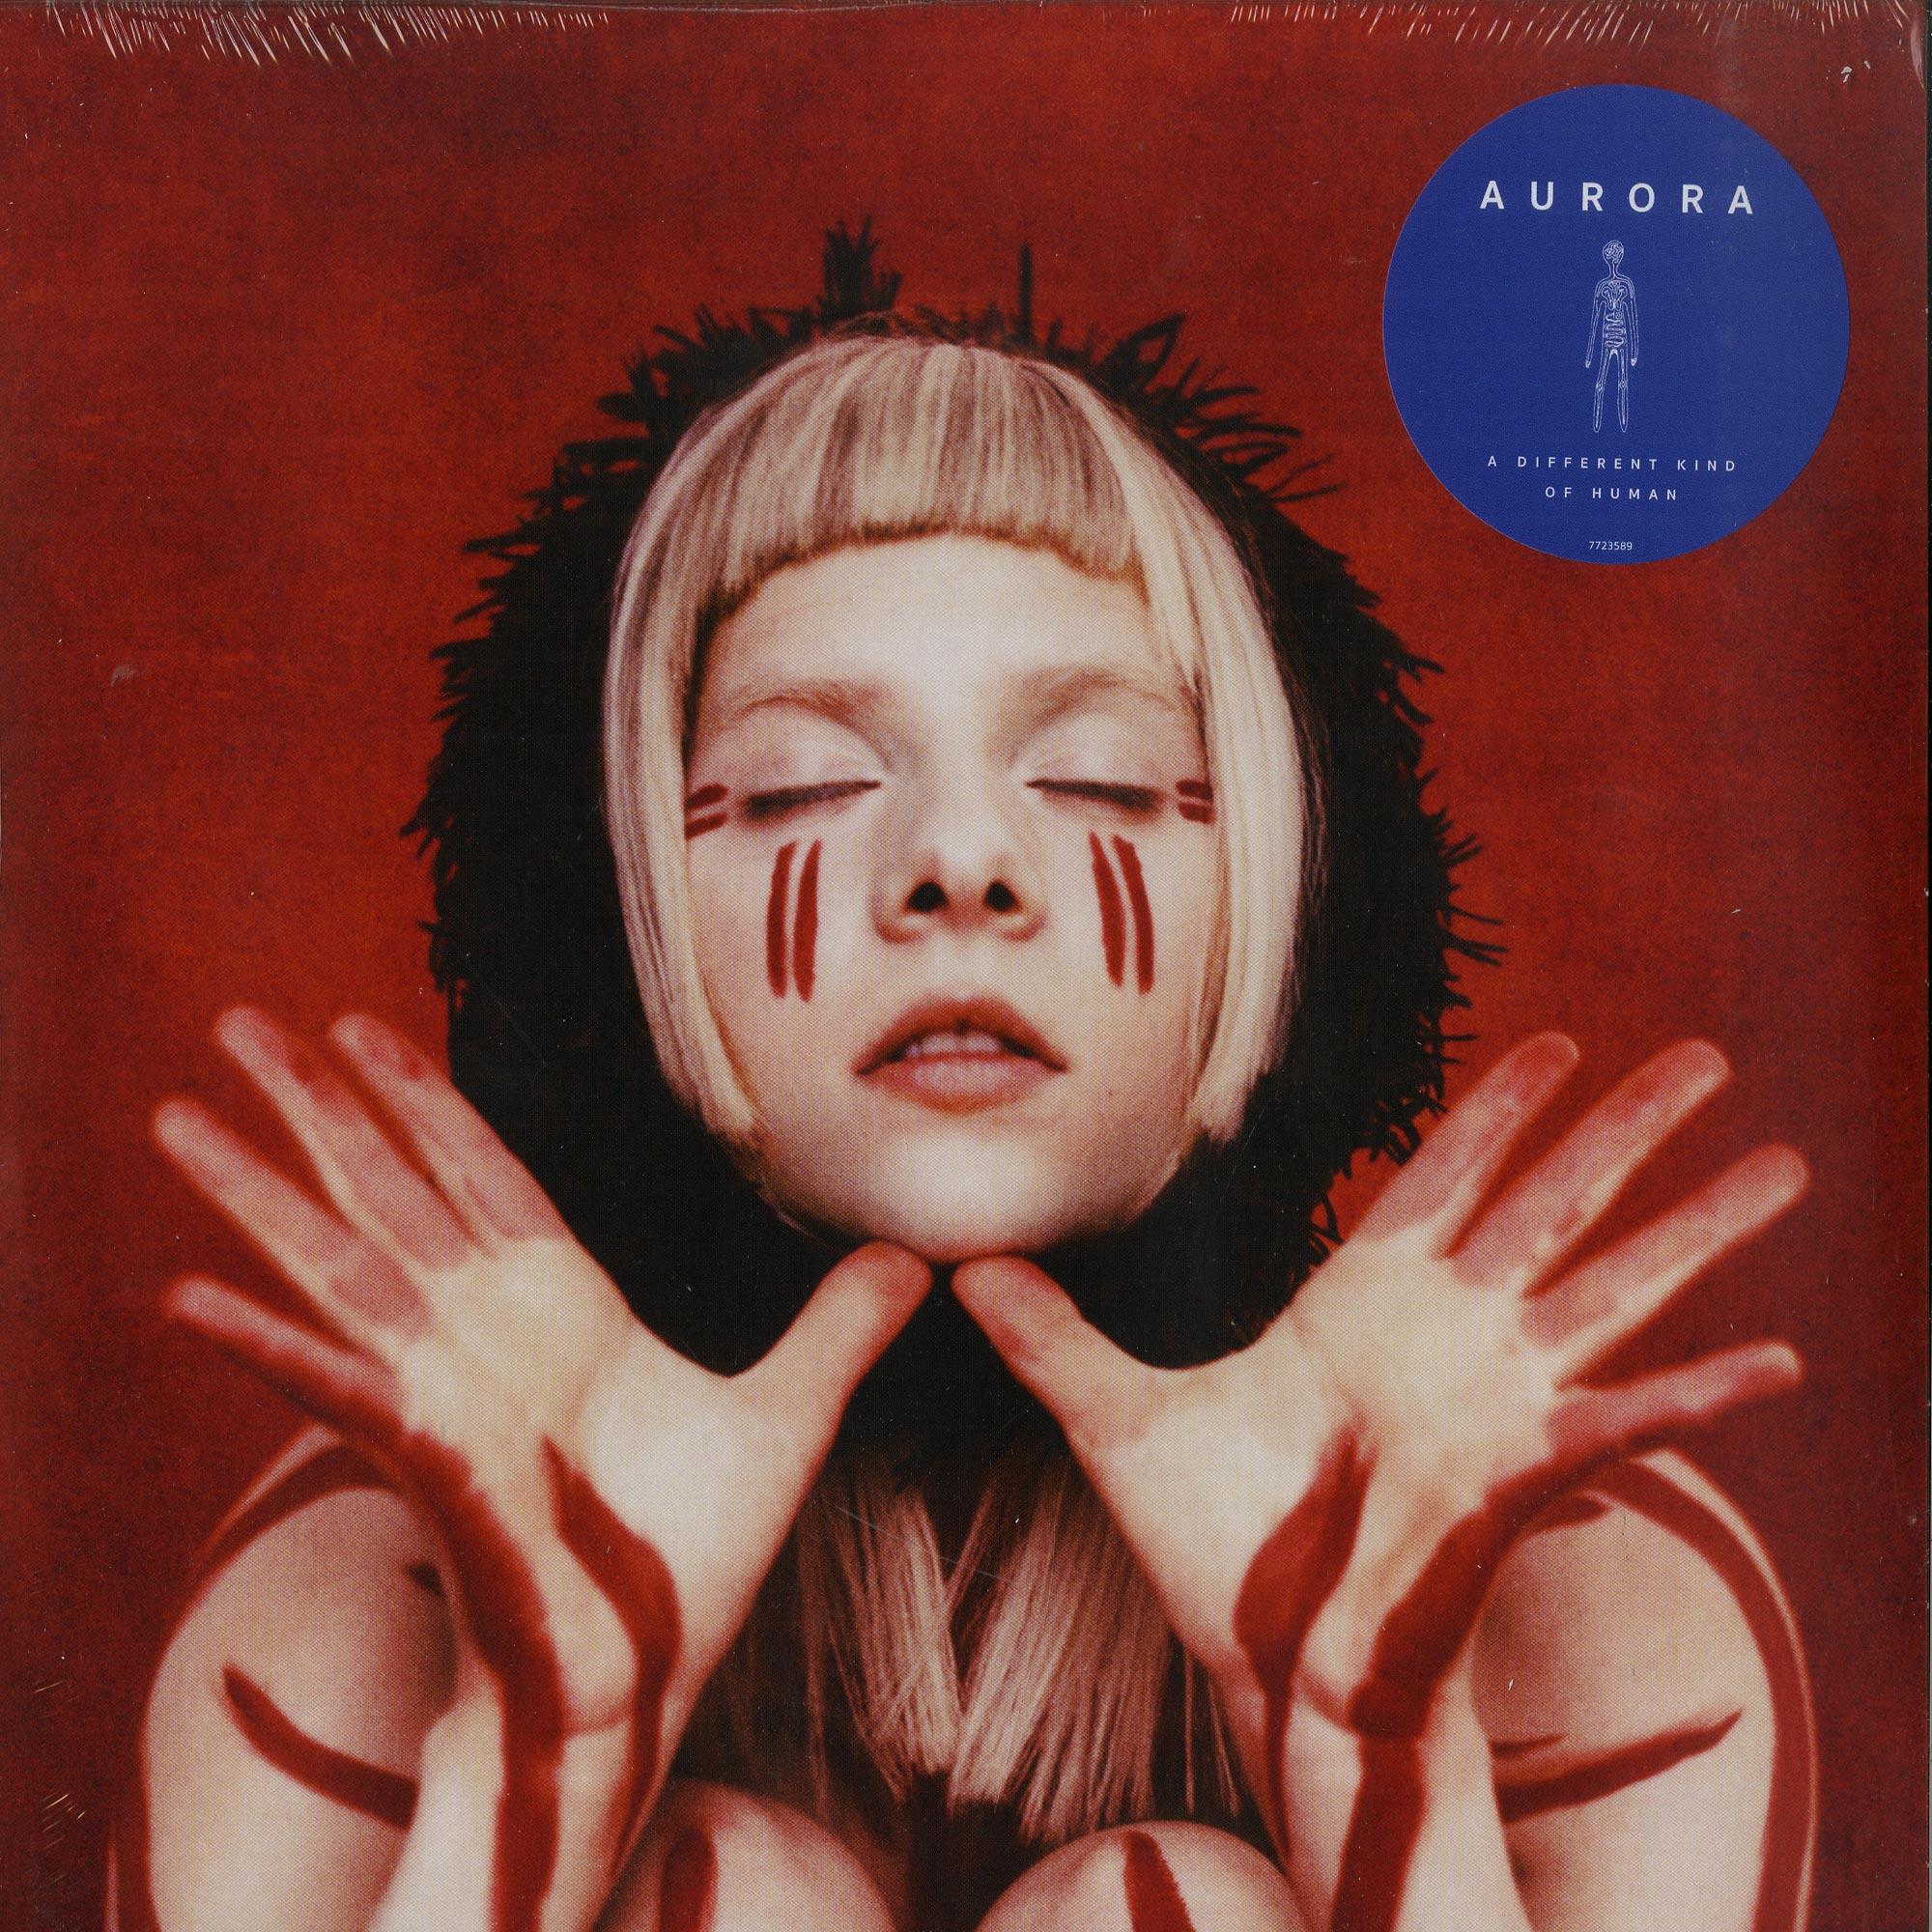 Aurora - A DIFFERENT KIND OF HUMAN - STEP 2